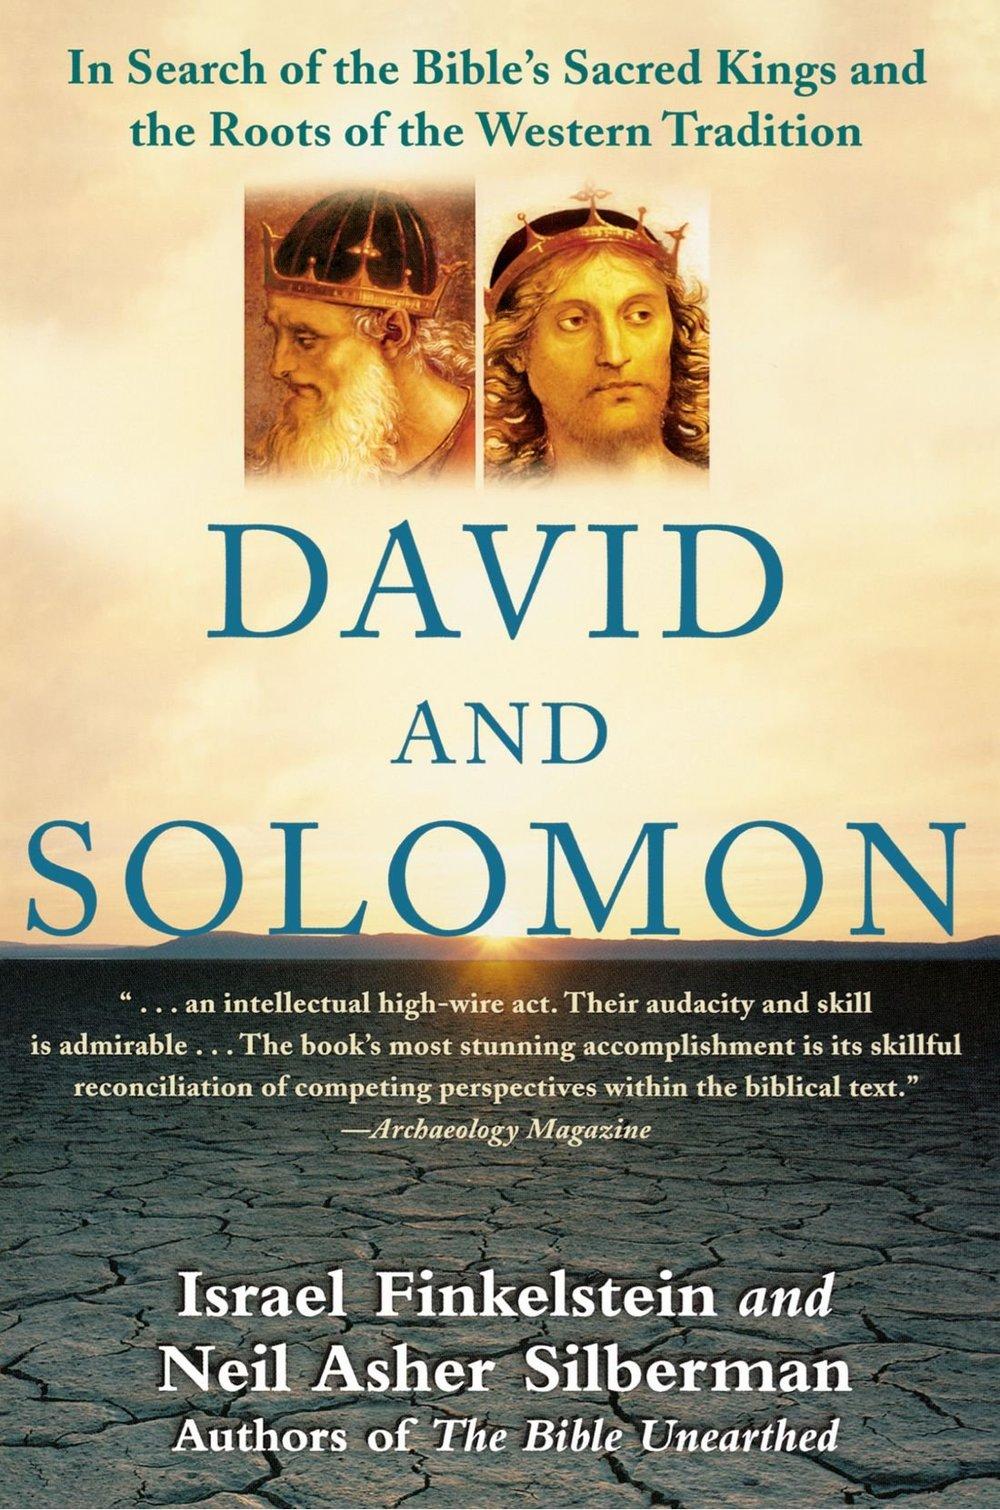 David and Solomon.jpg